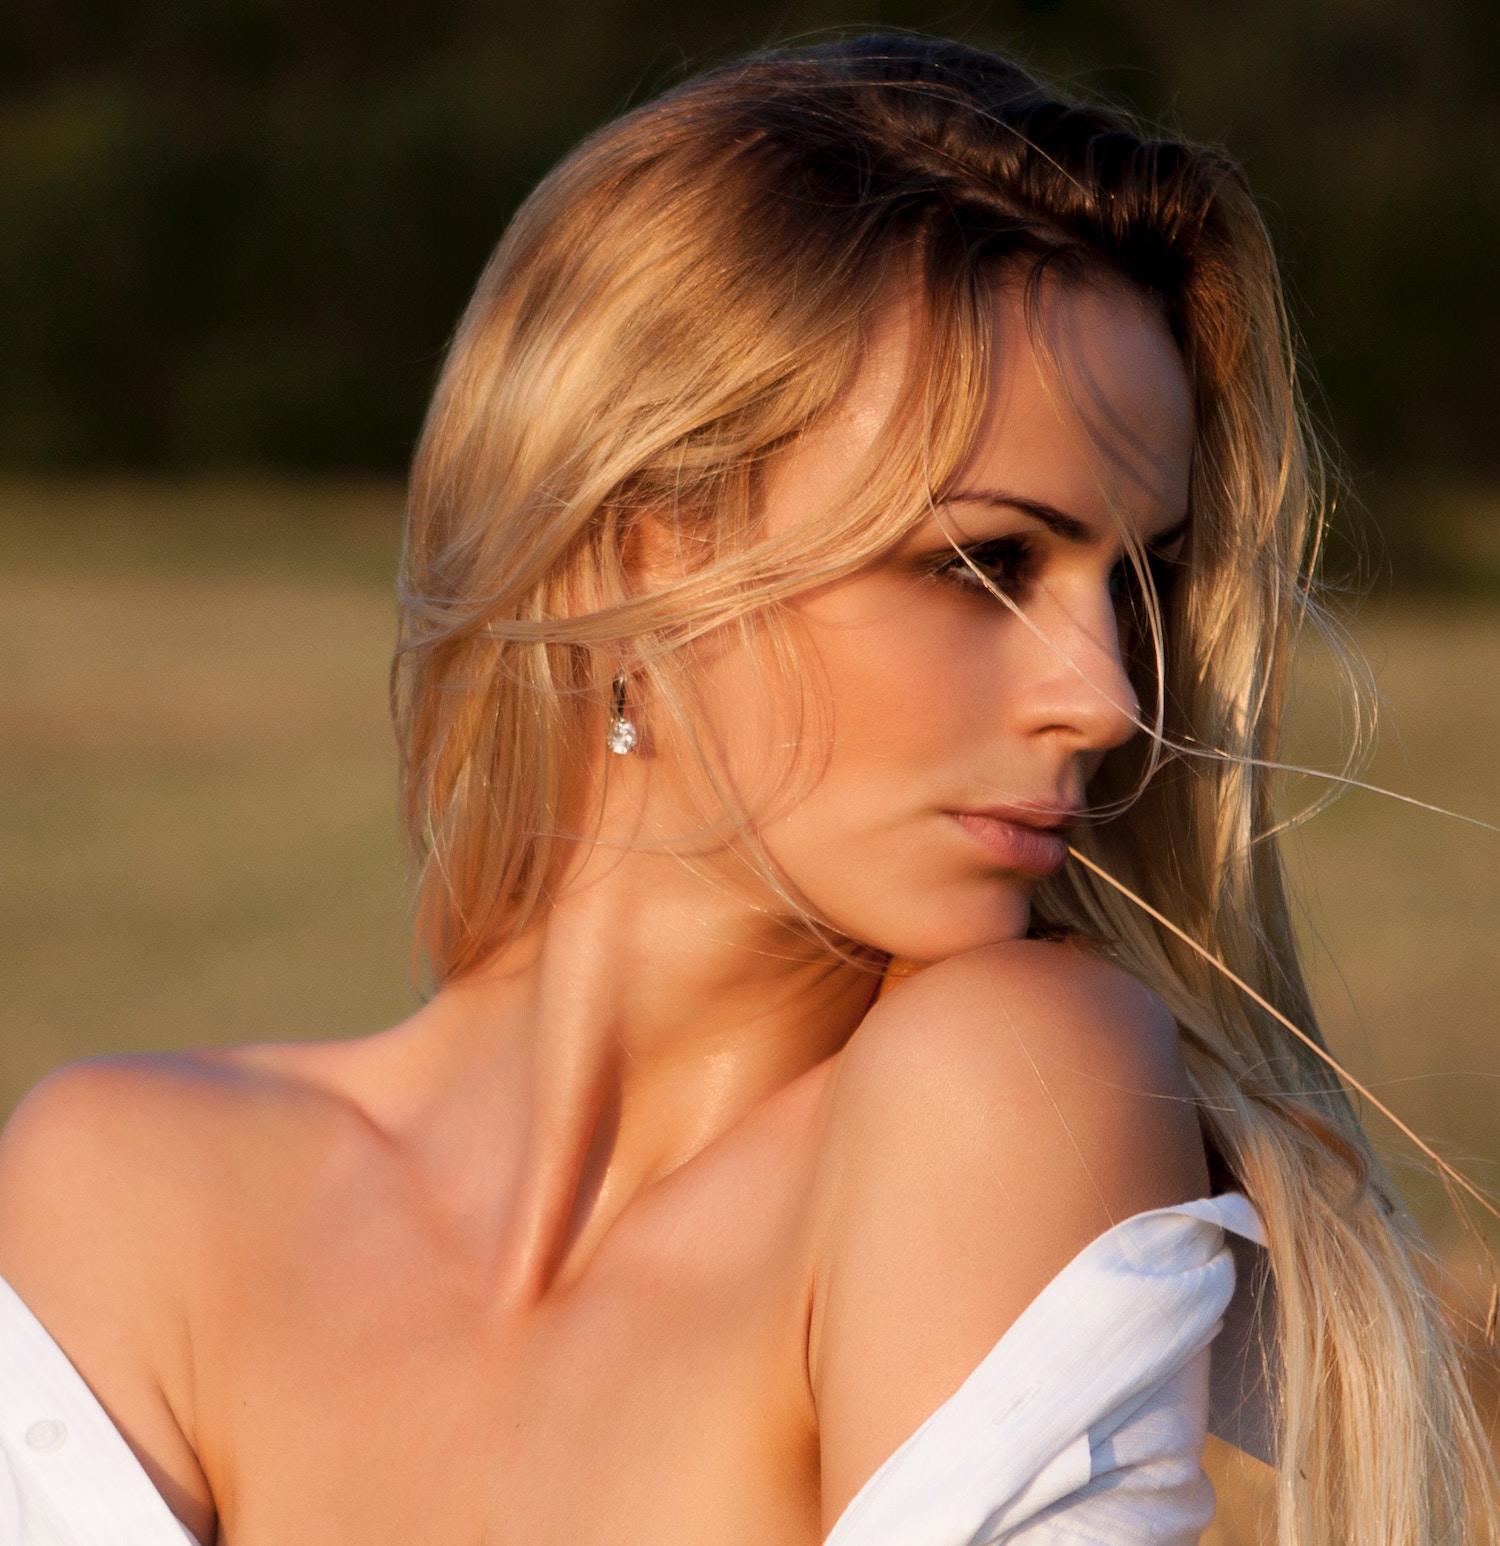 Babor-Skinovage-PX-Intensifier-Firming-Neck-Decollete-Cream-abloomnova.net_ Do you moisturise your chest?